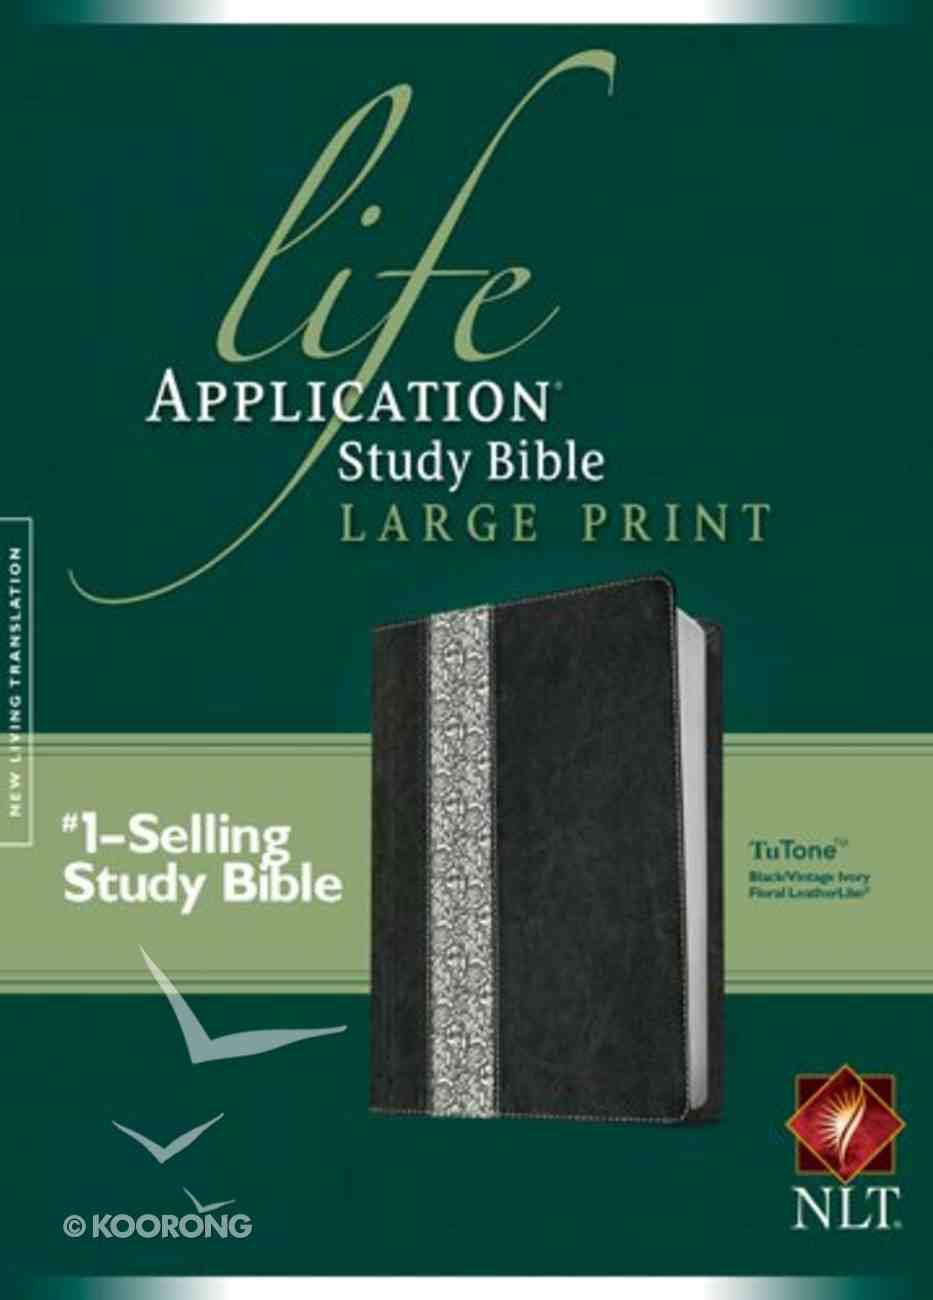 NLT Life Application Large Print Study Bible Black Vintage Ivory Floral (Red Letter Edition) Imitation Leather